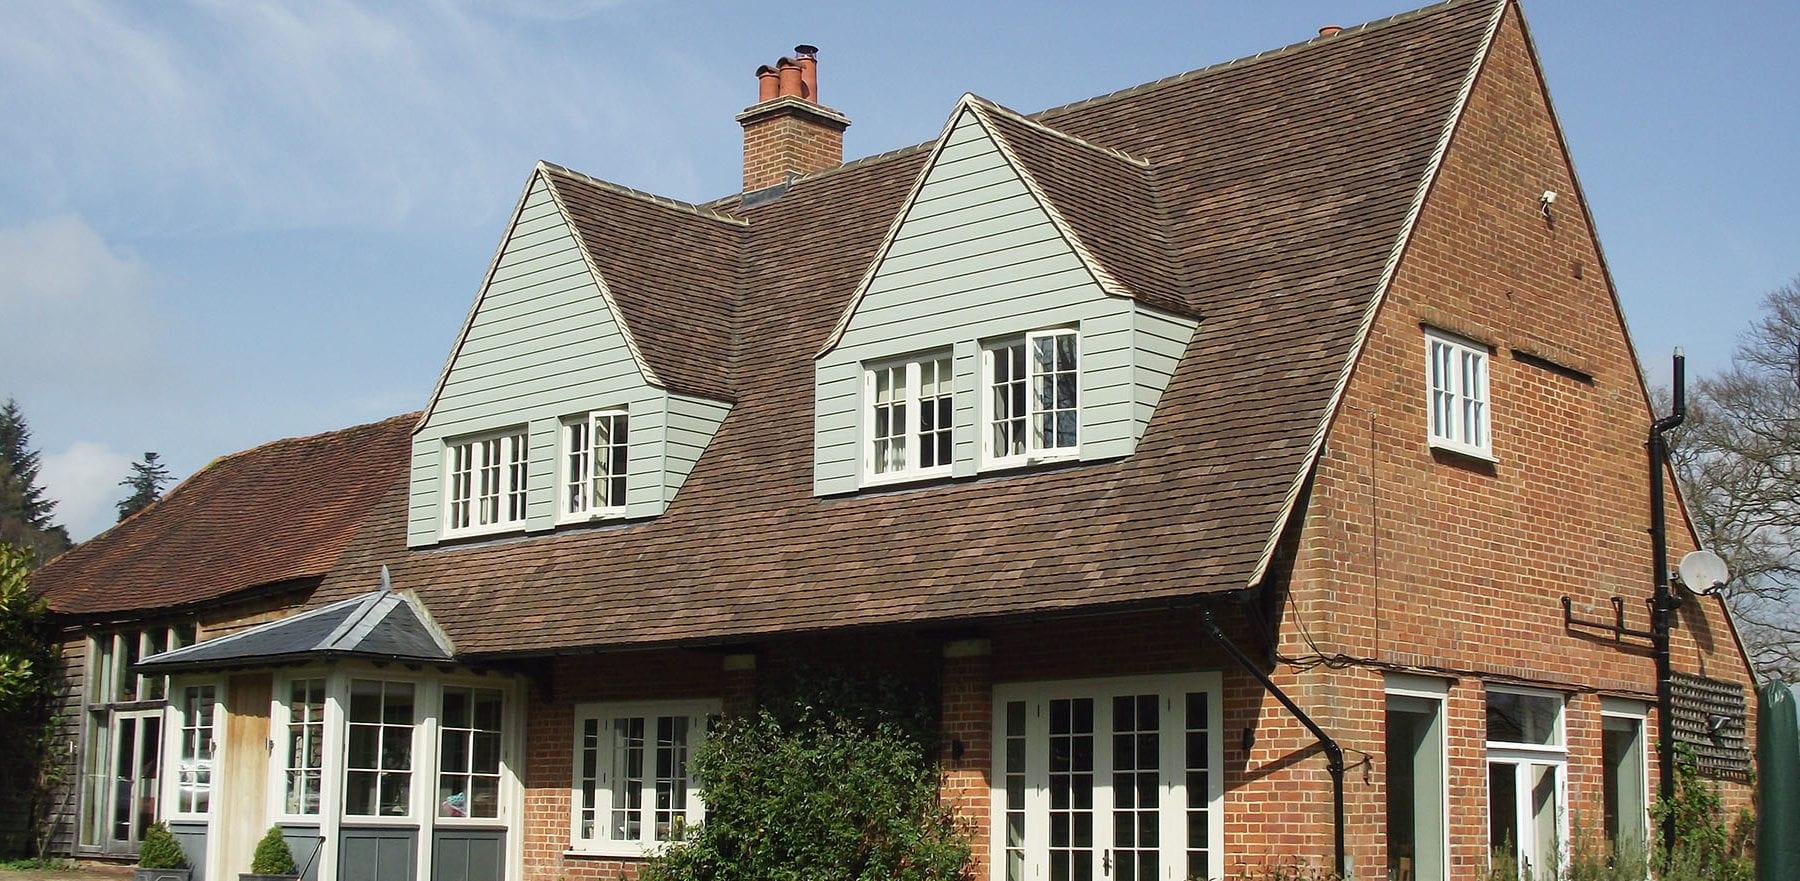 Lifestiles - Handmade Restoration Clay Roof Tiles - Liphook, England 2